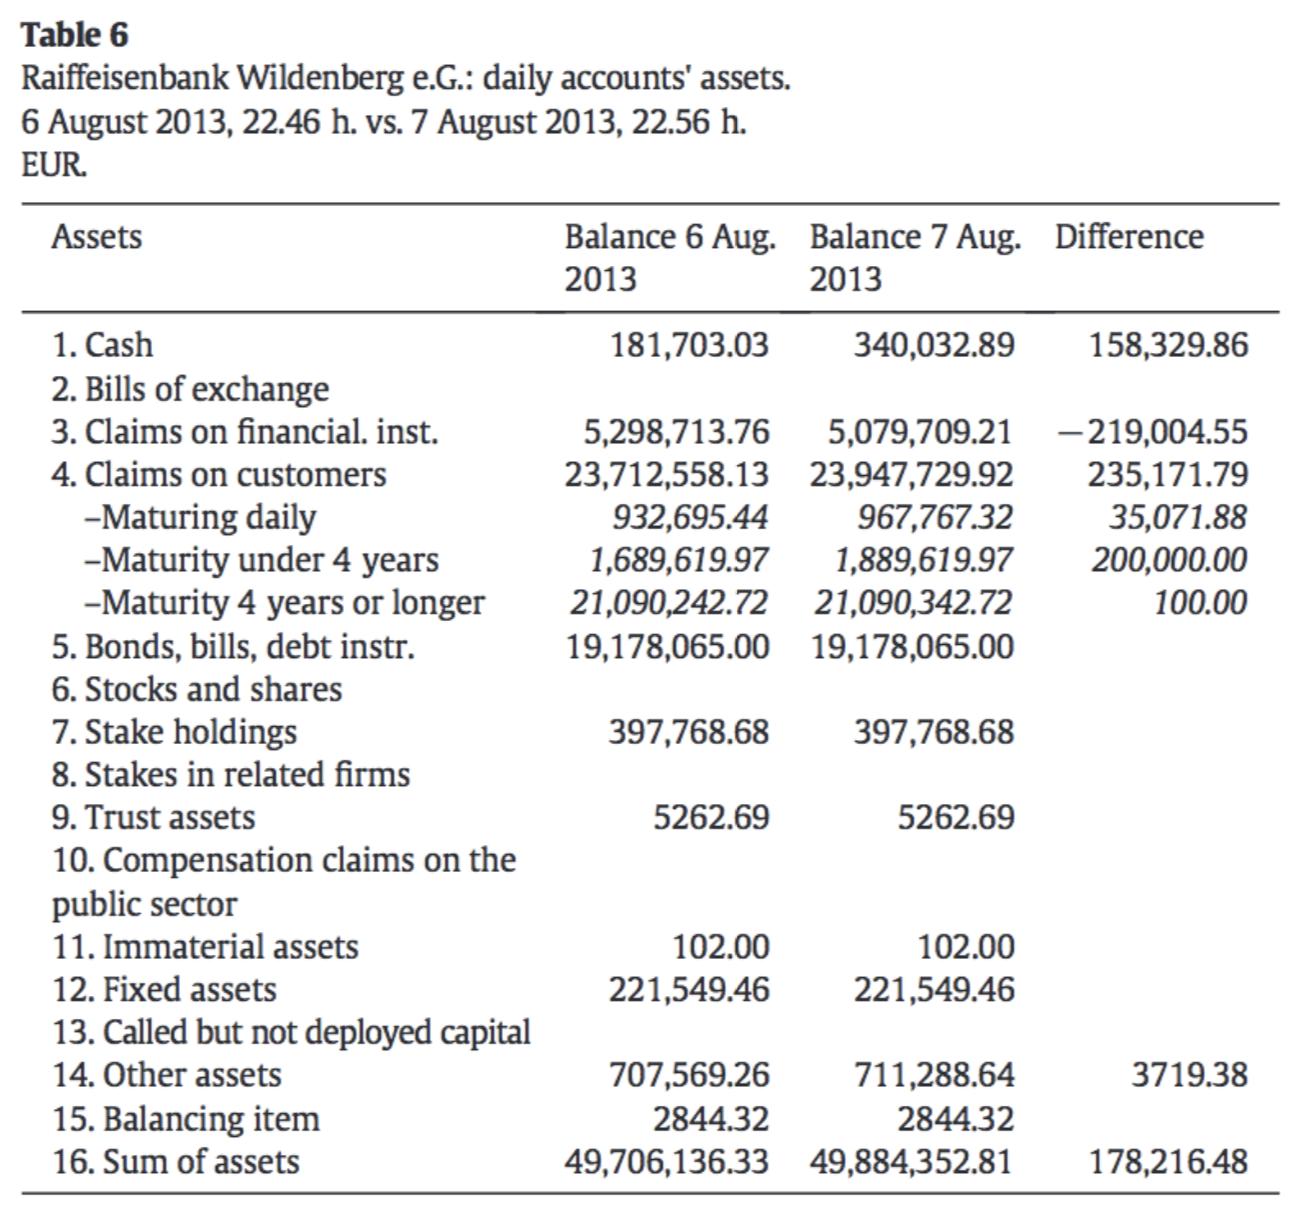 Asset side of the balance sheet